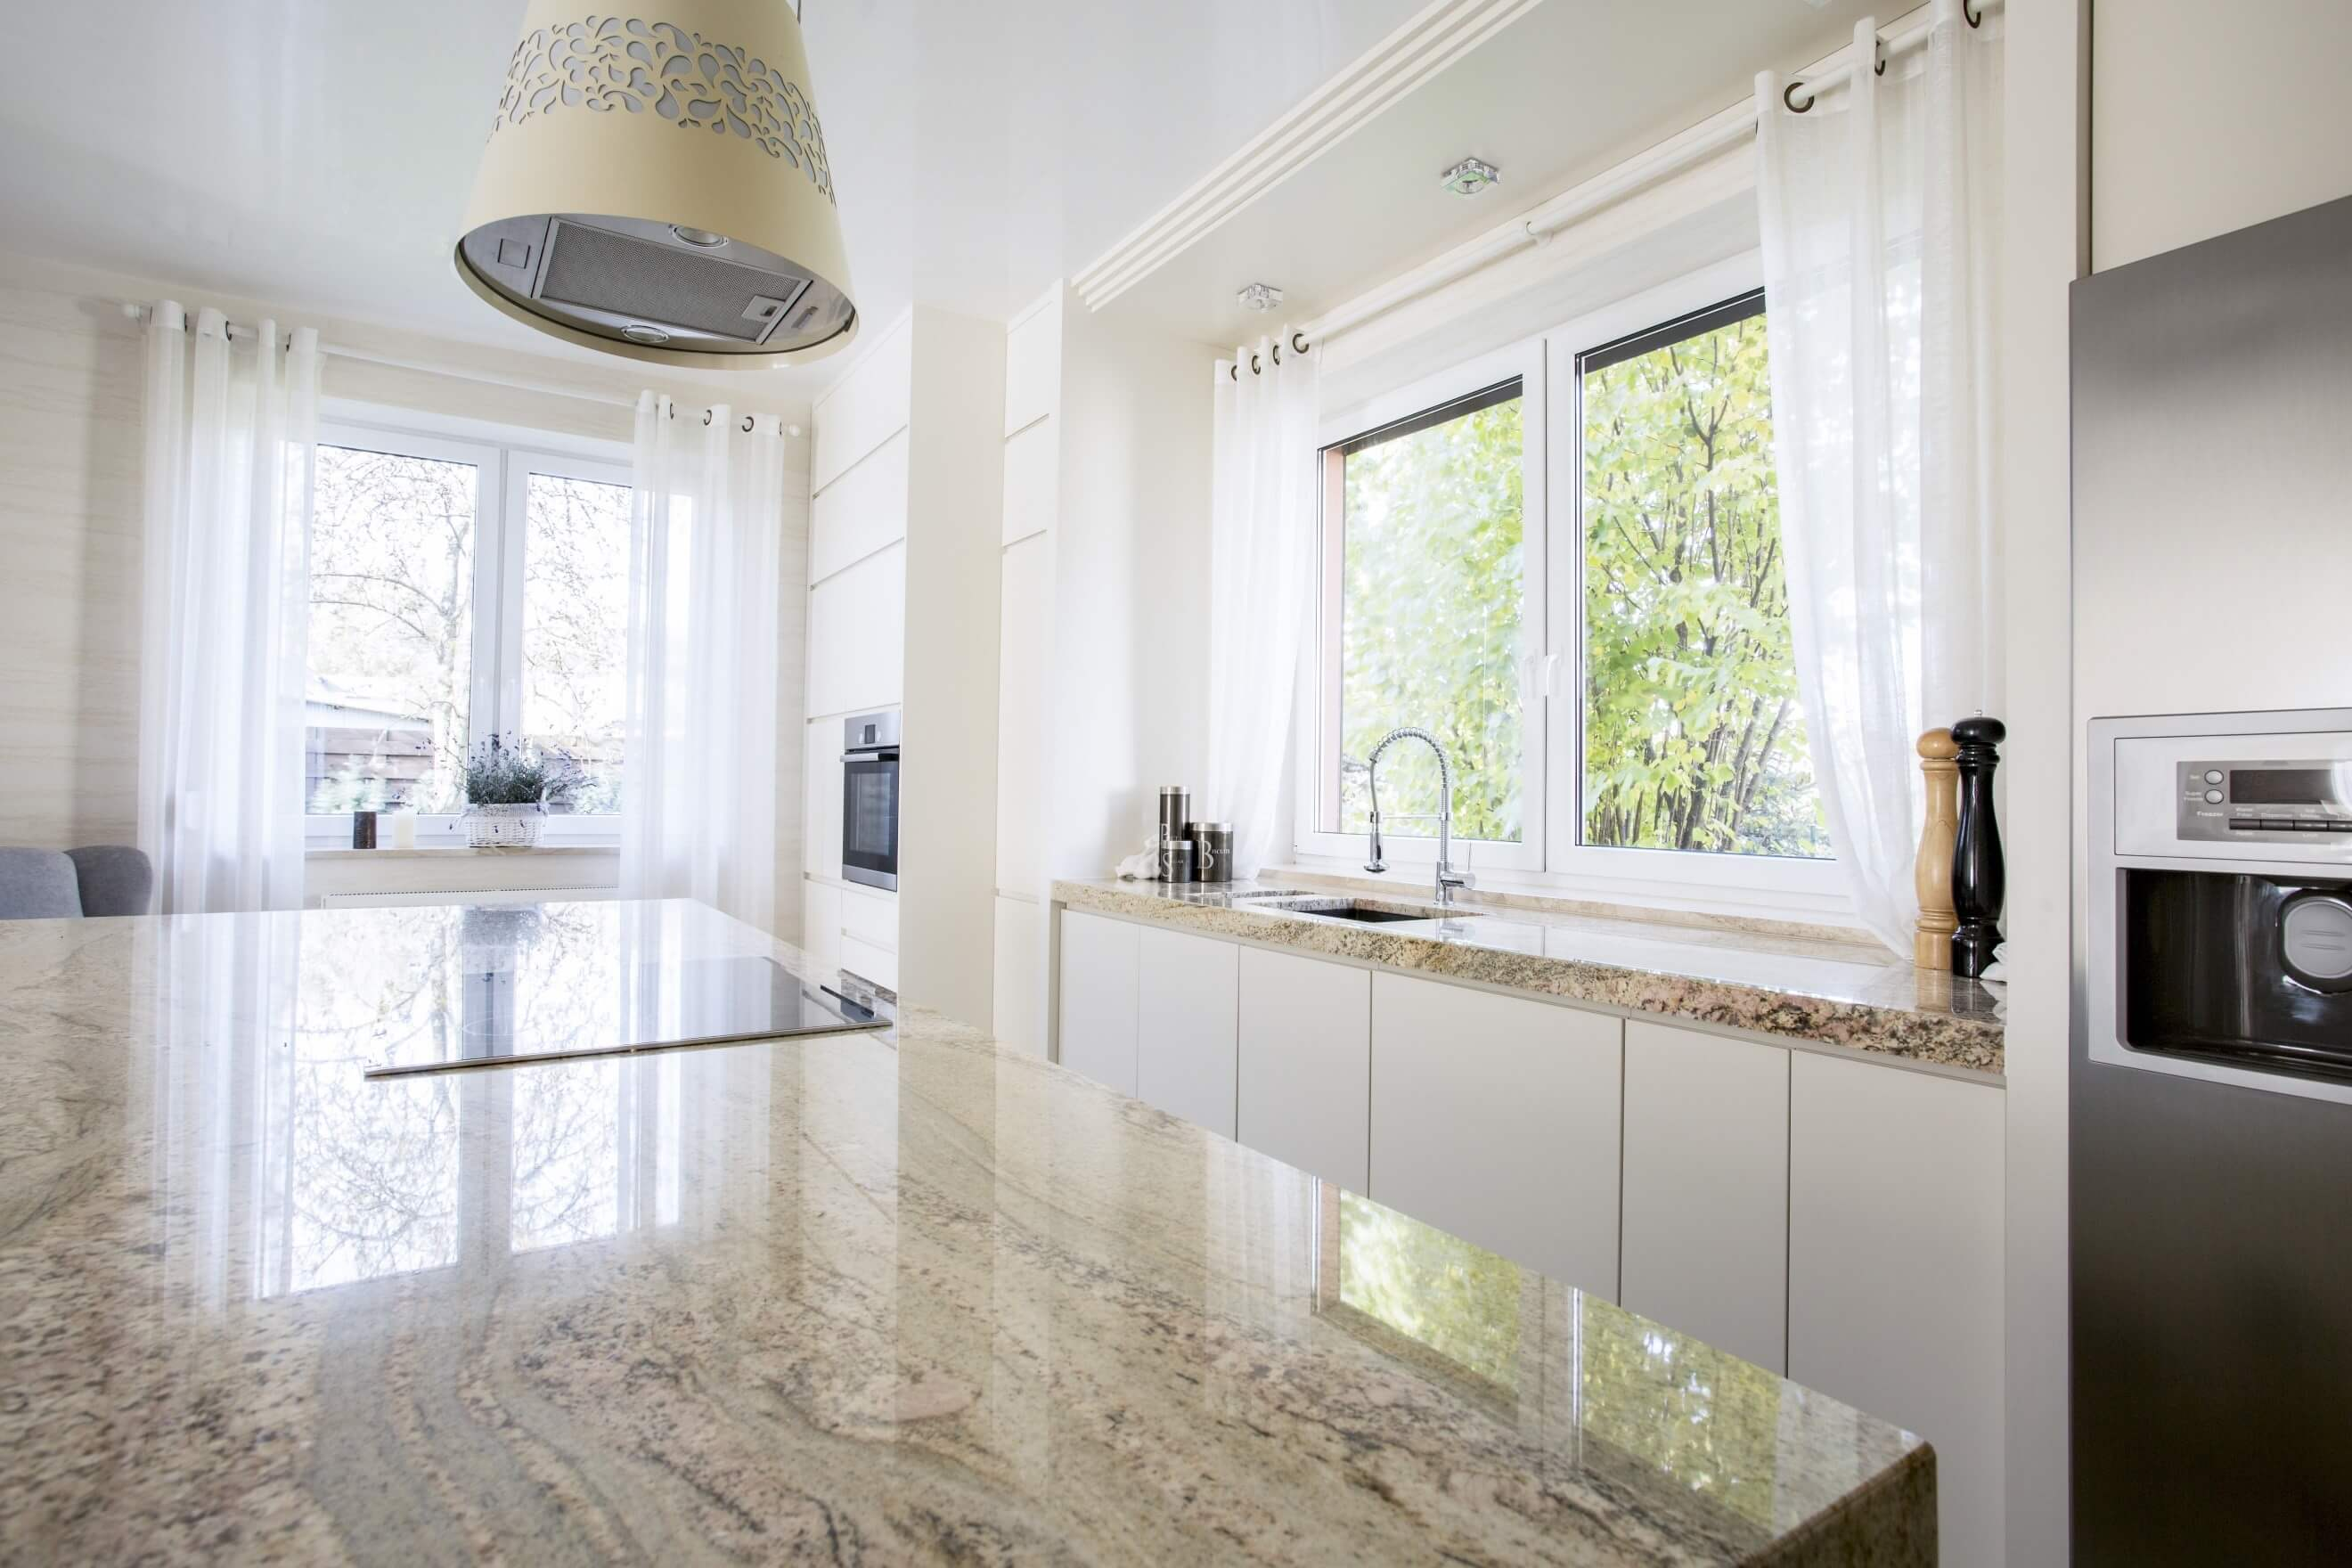 light shining off a stone kitchen worktop